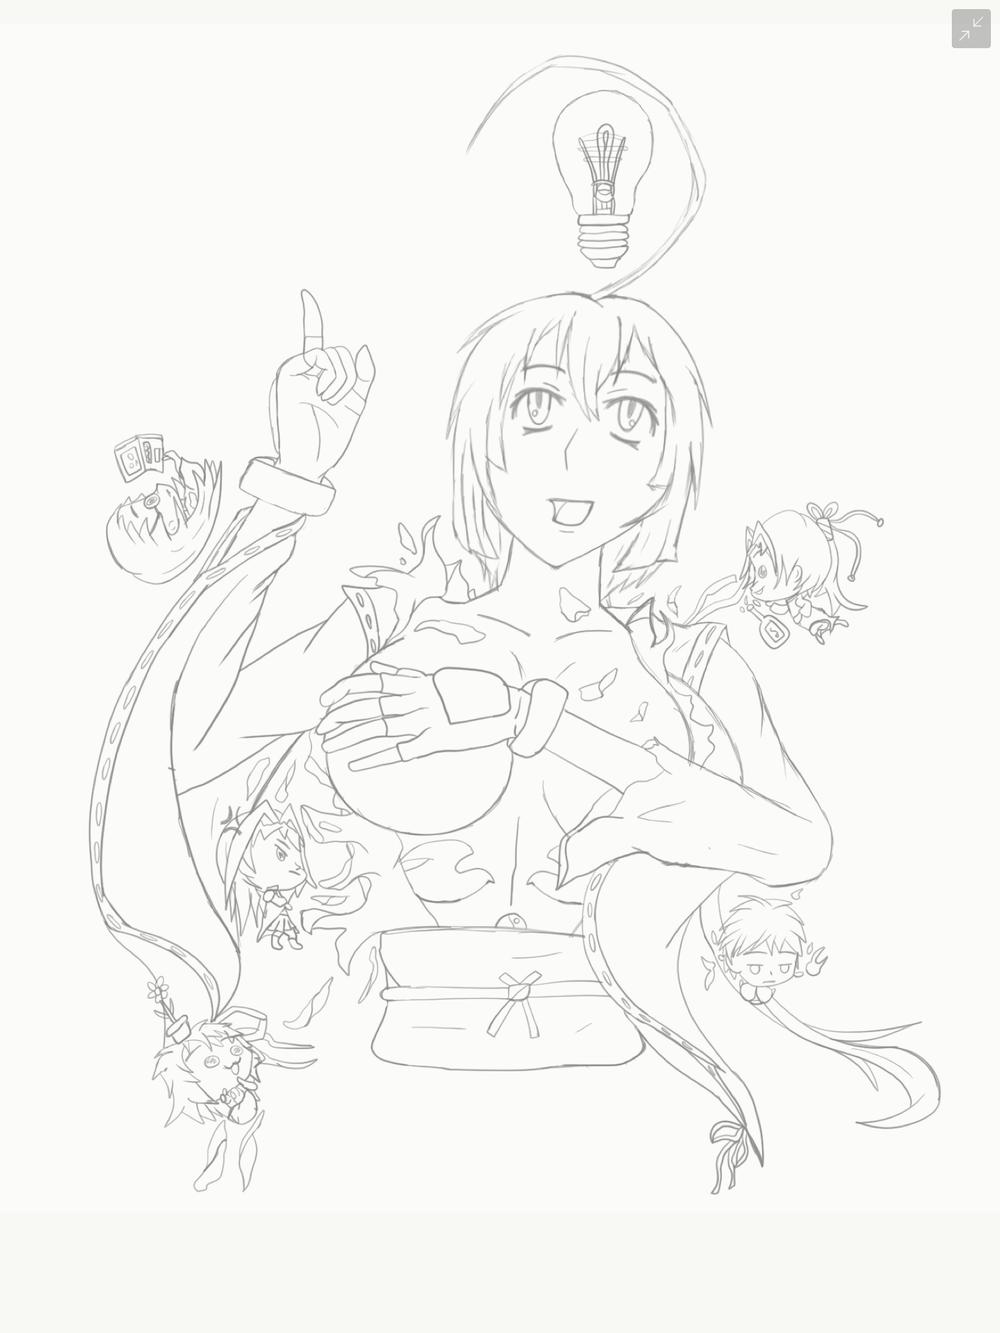 sekirei-anime-art-process-images-1.png